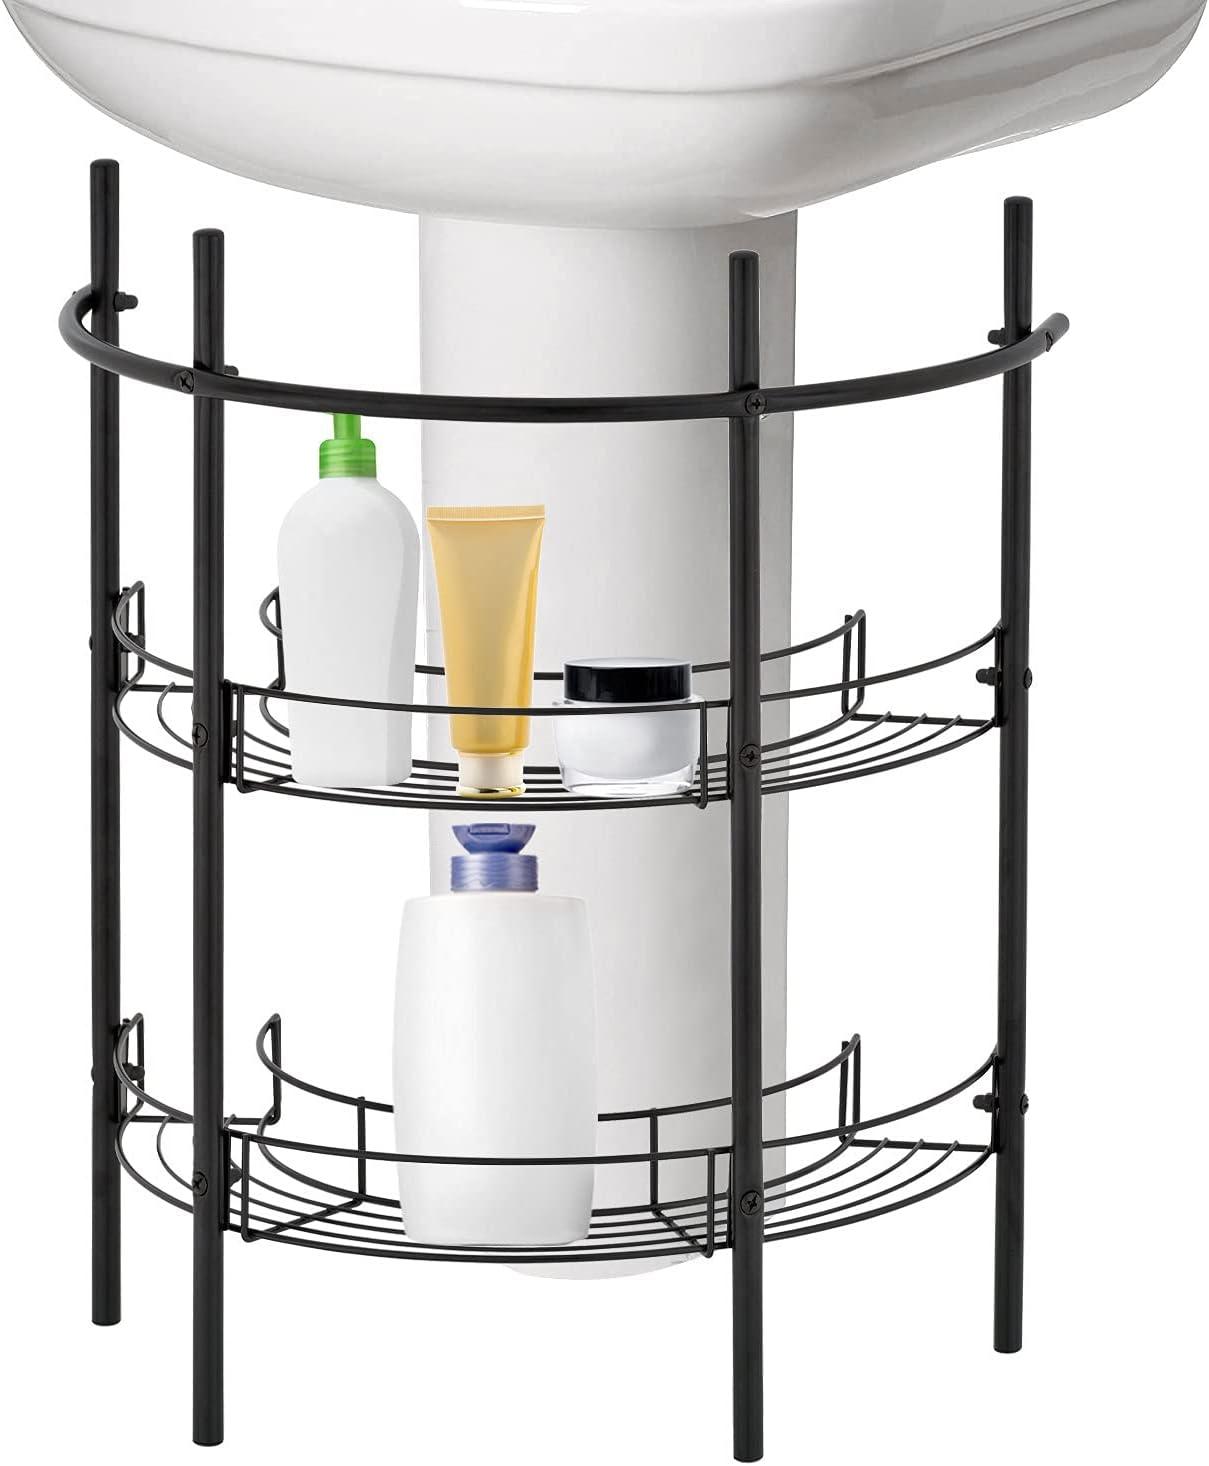 Amazon Com Mygift Under The Sink Bathroom Quality Pedestal Black Metal Storage Rack With 2 Shelves Hand Towel Bar Home Kitchen